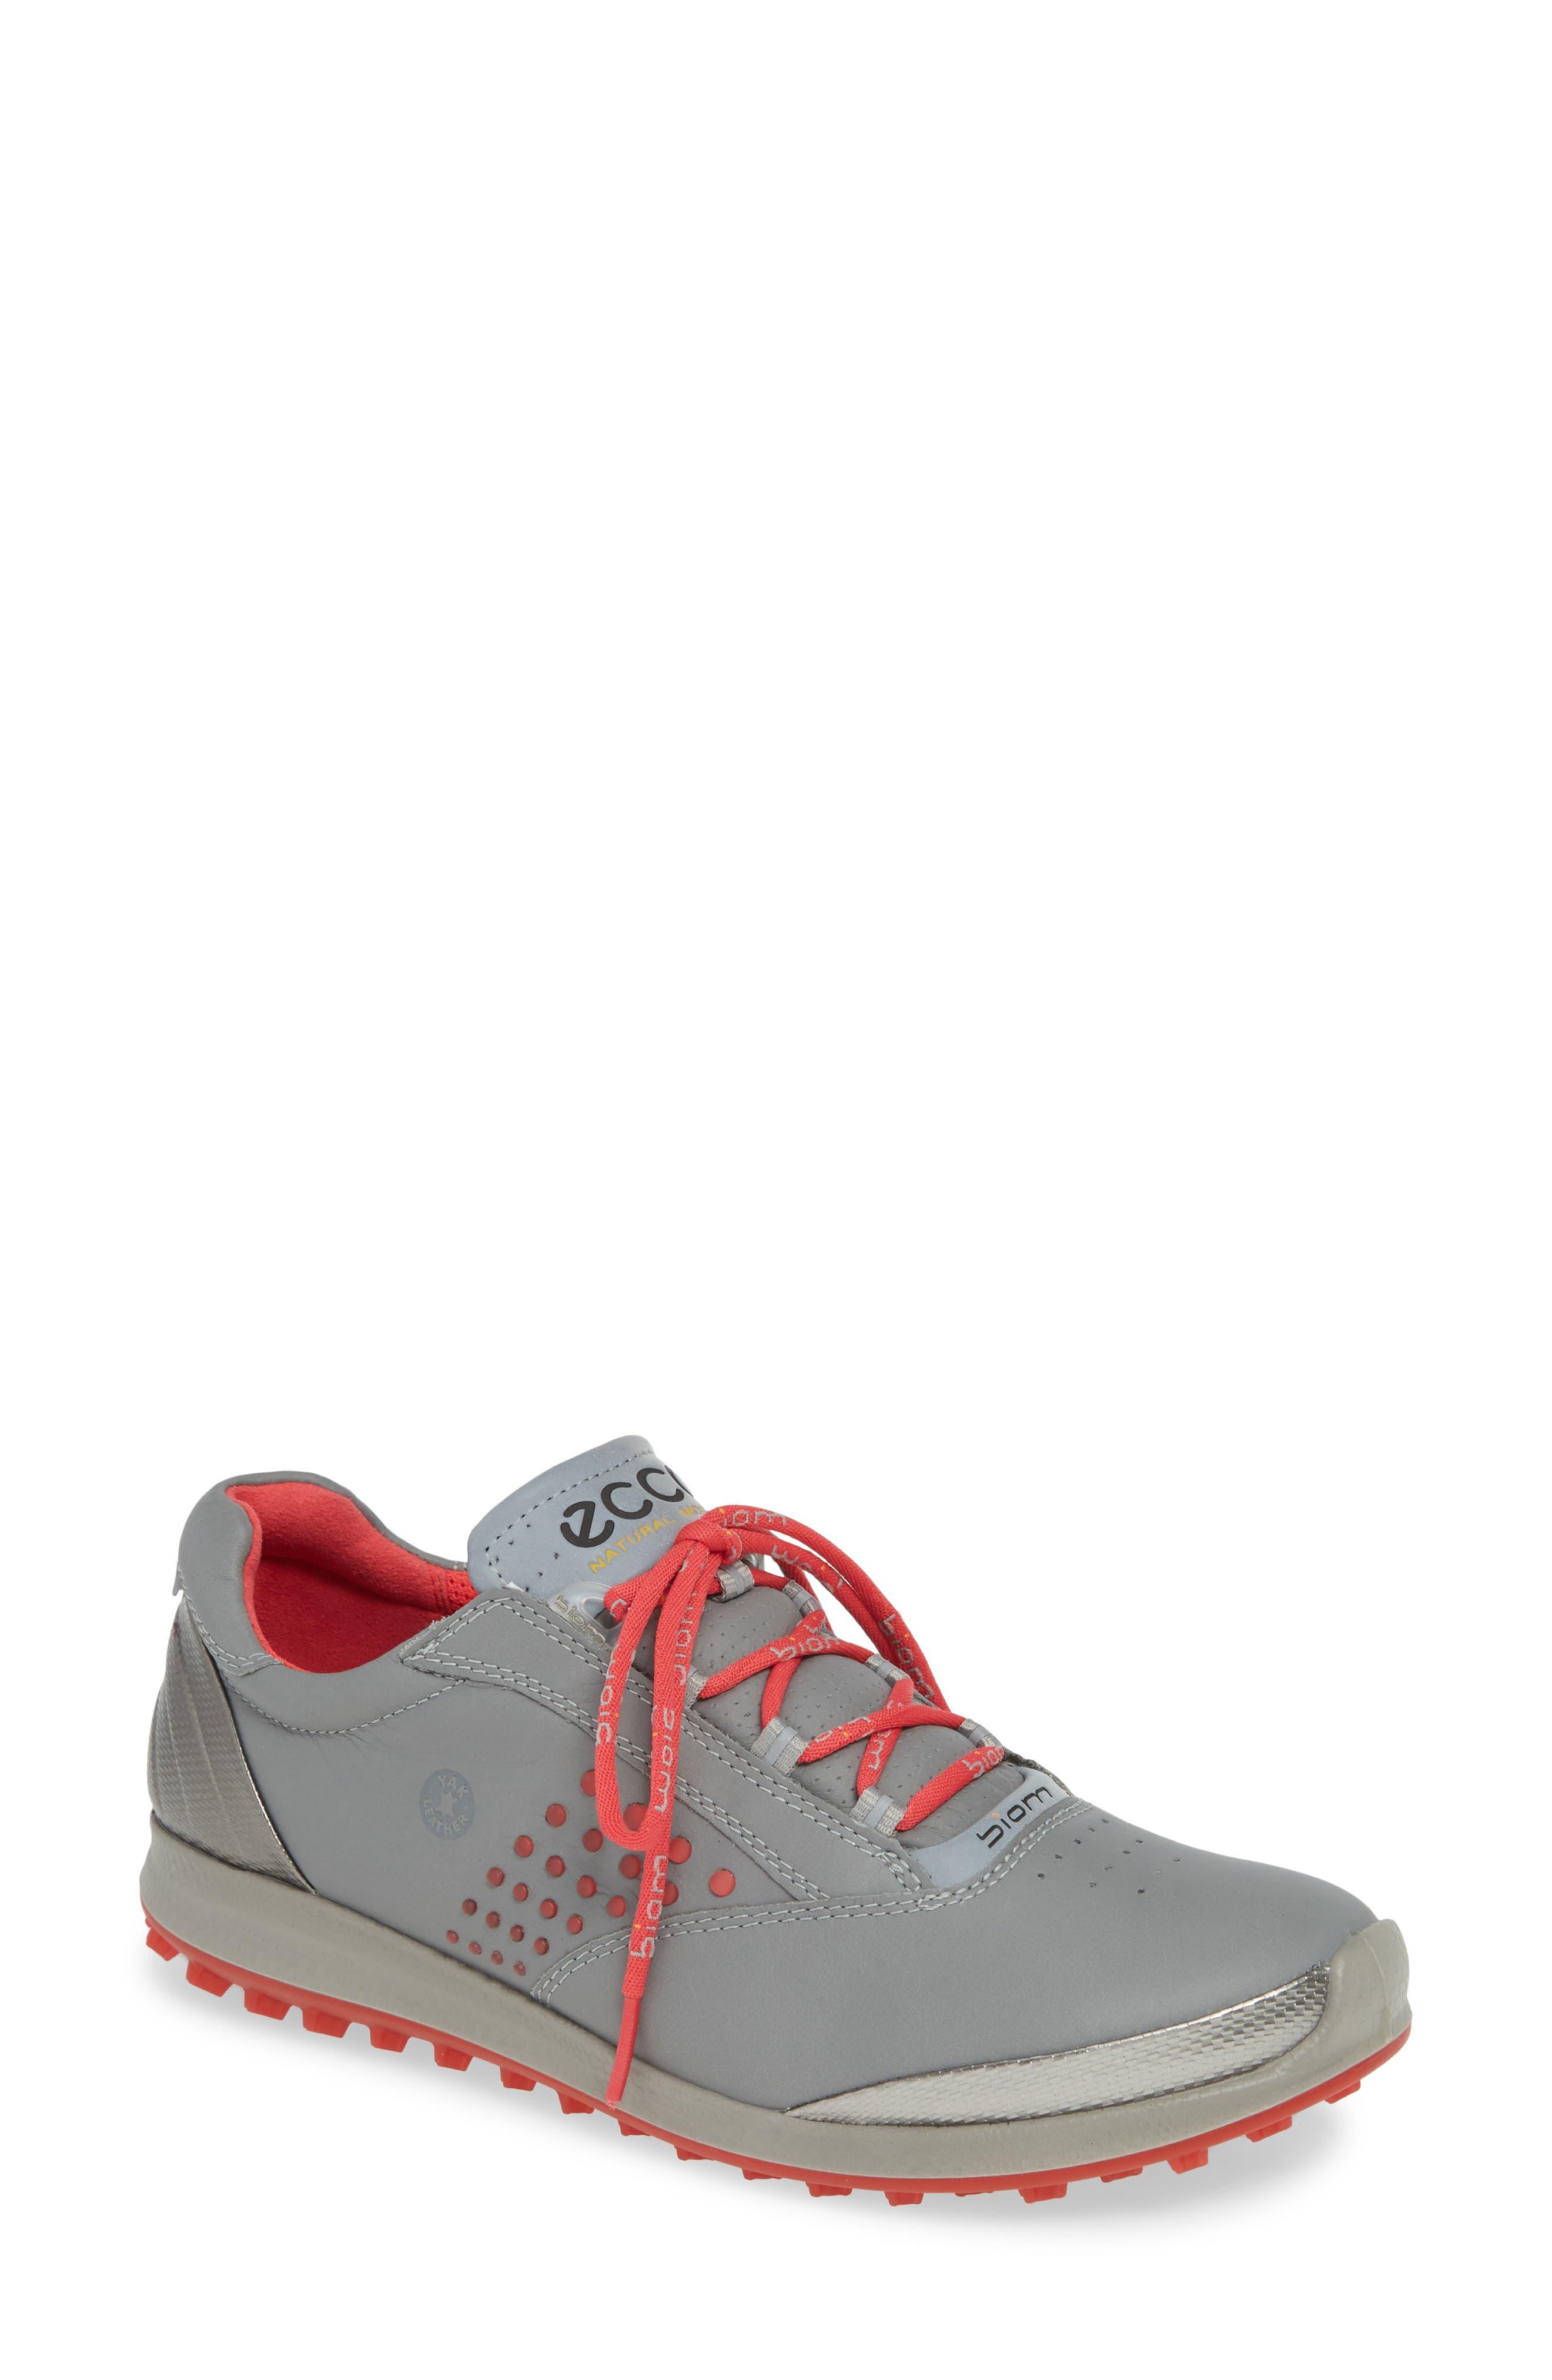 Ecco Biom Hybrid 2 Waterproof Golf Shoe, Grey